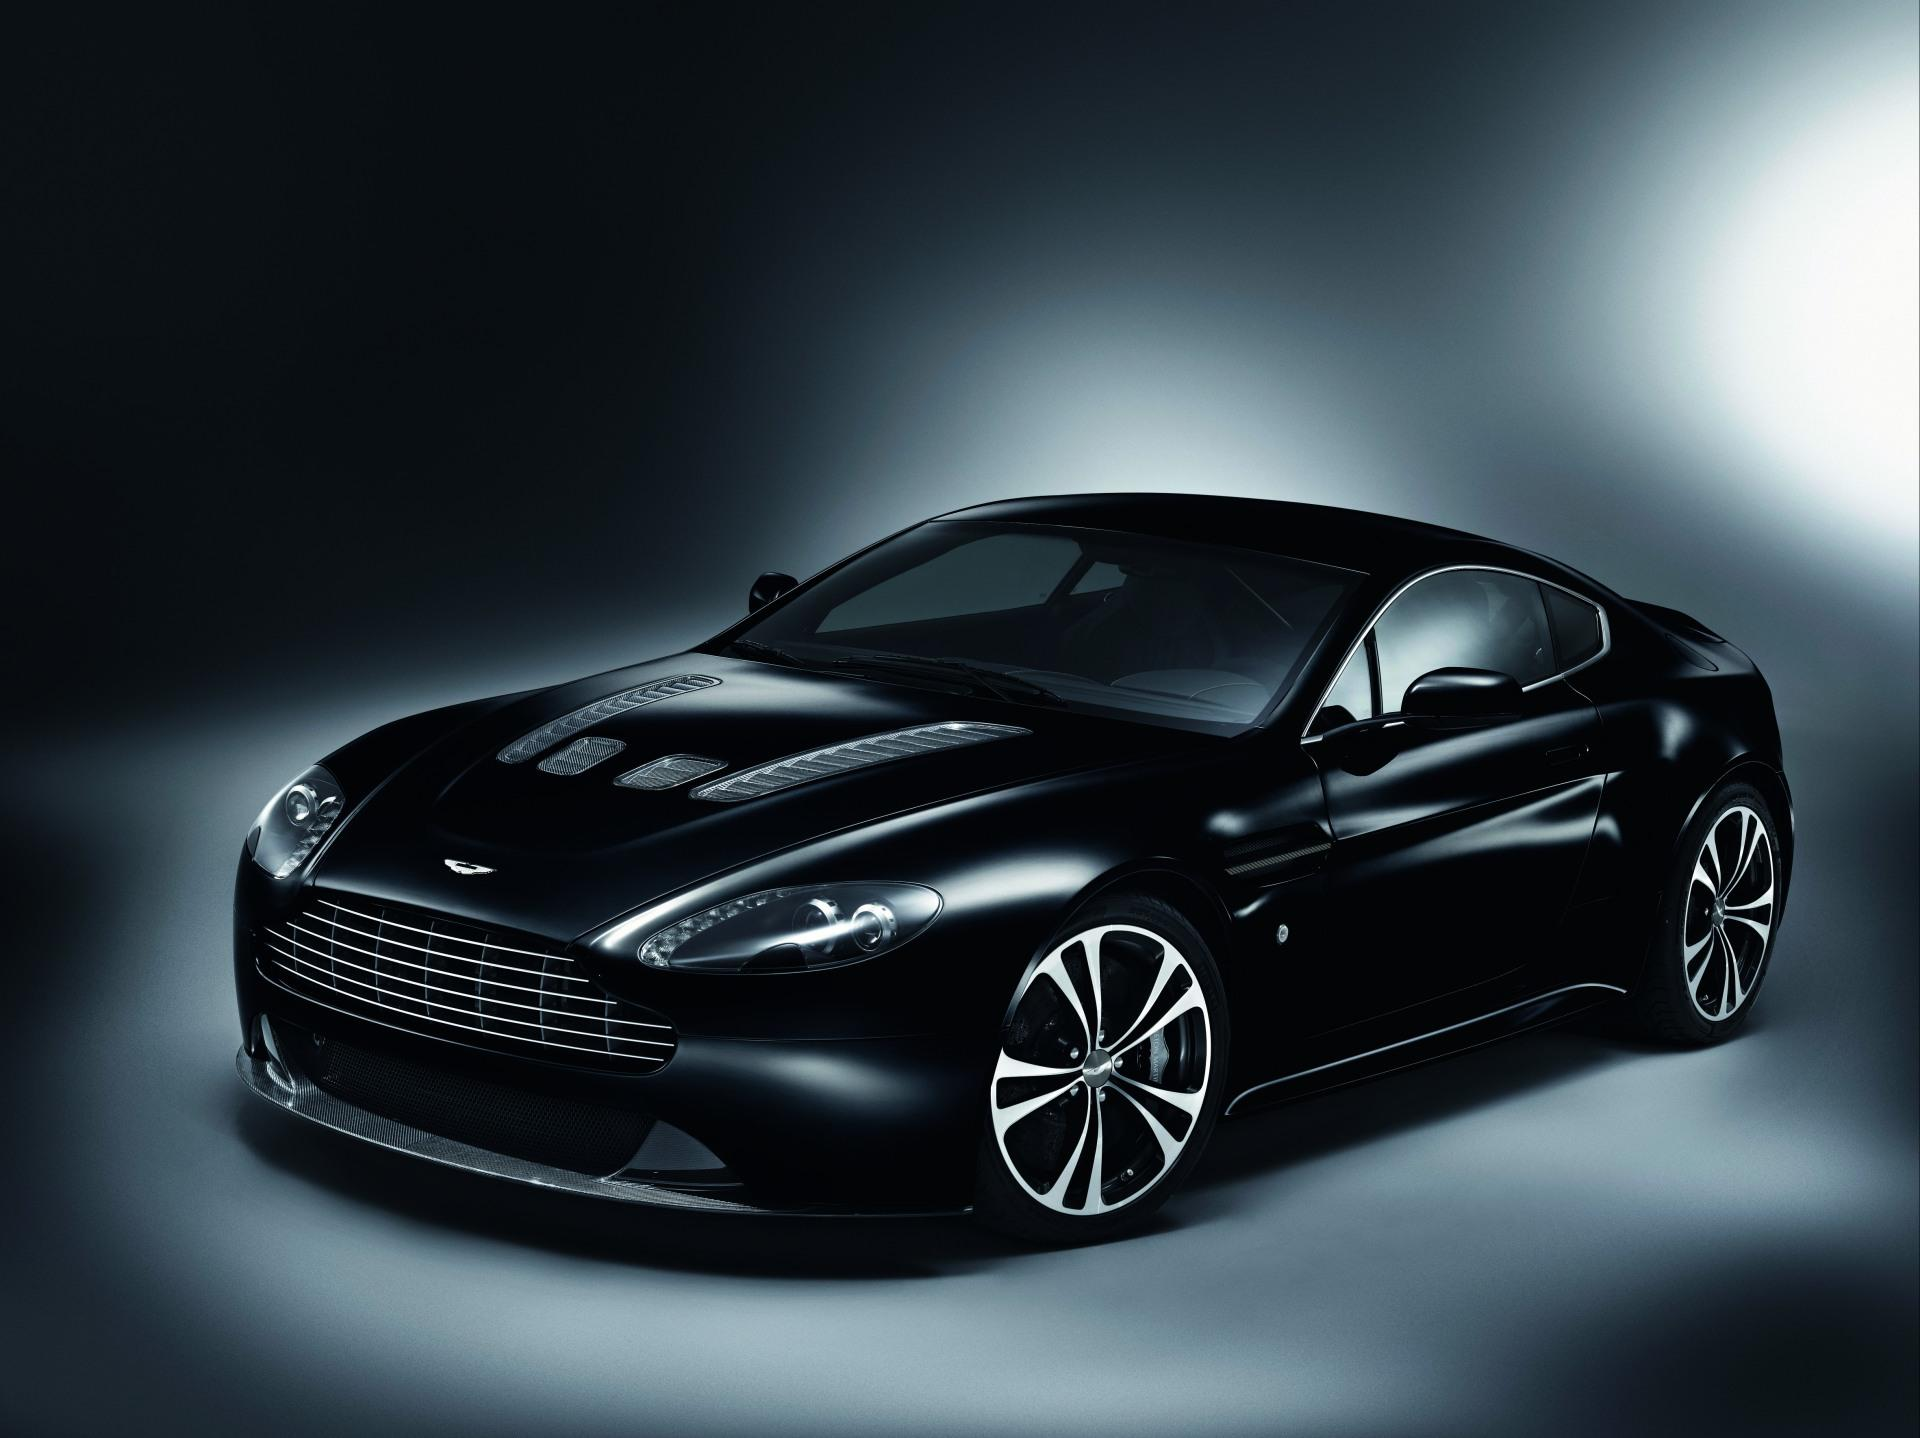 2010 Aston Martin V12 Vantage Carbon Black Edition News And Information